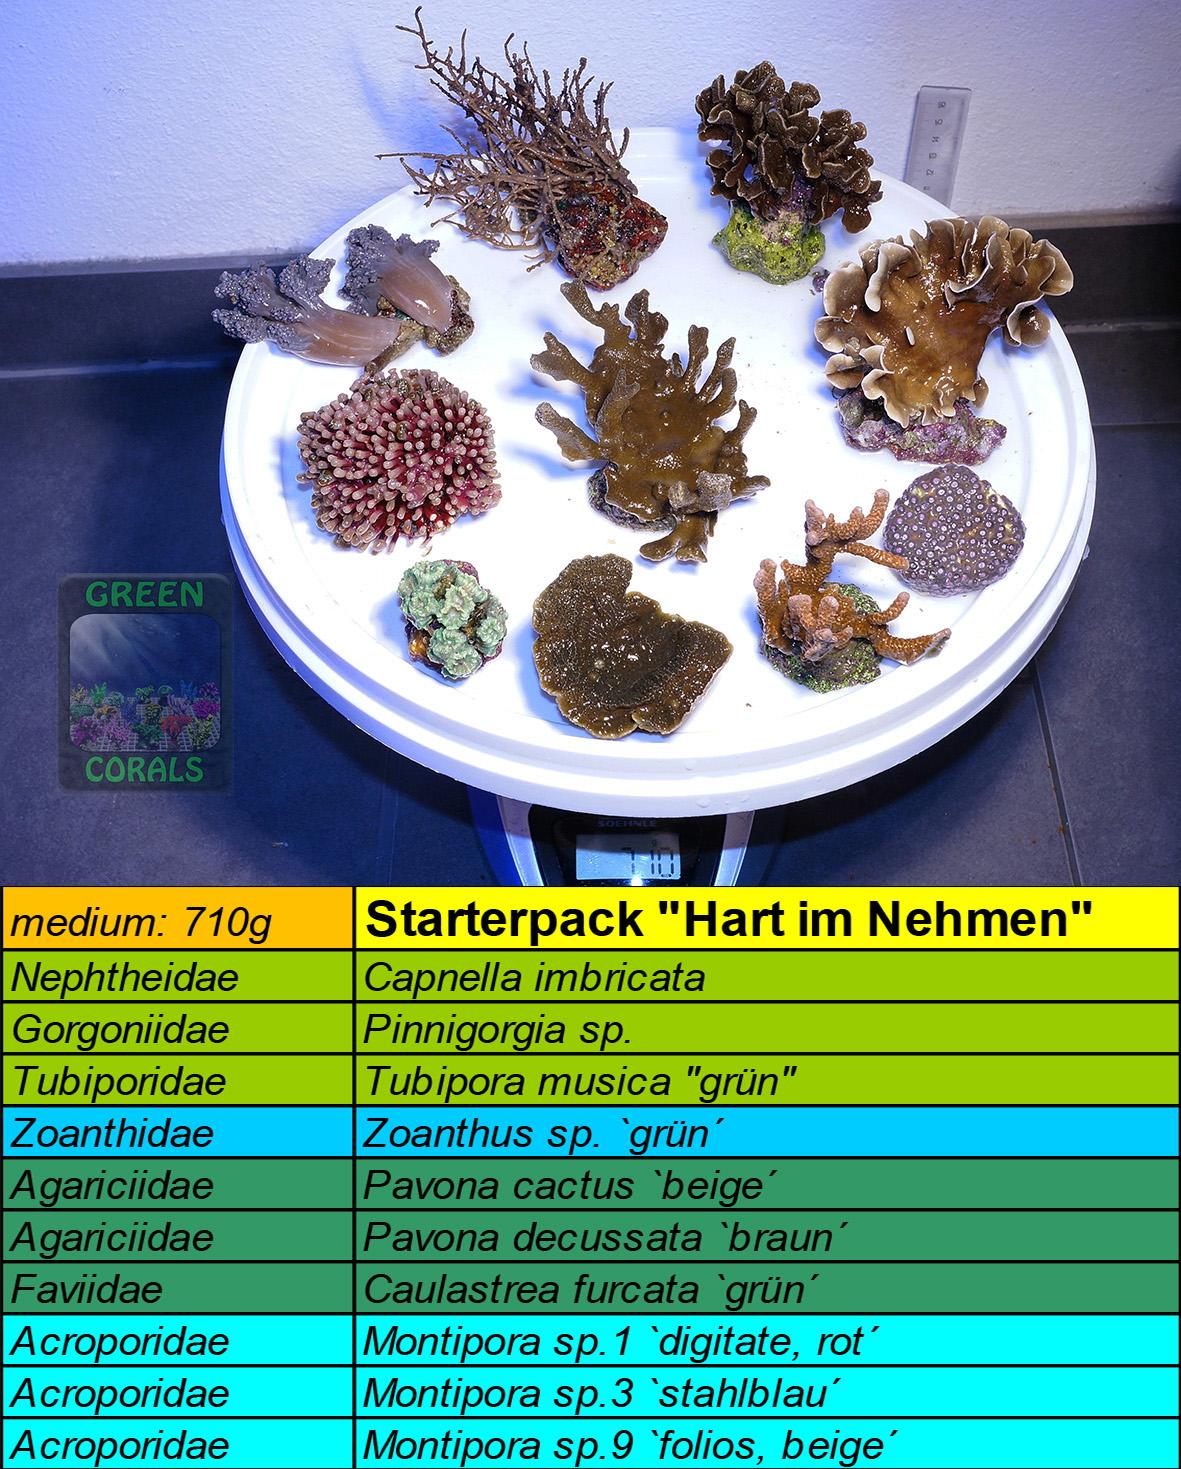 1 Starterpack Hart-im-Nehmen 710g